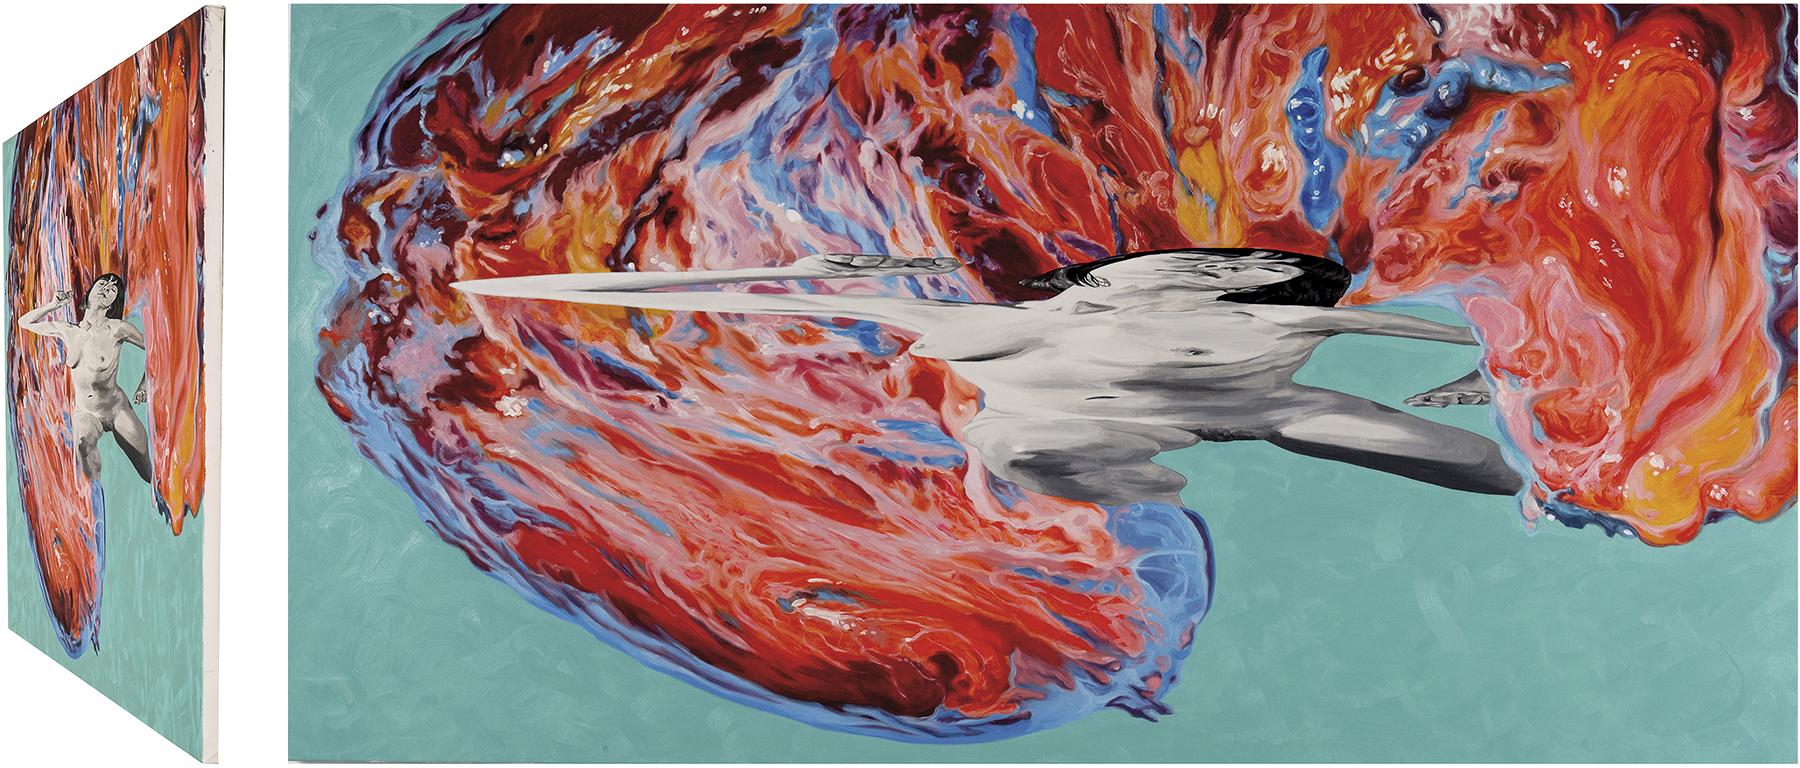 Laocoonte. Óleo sobre lienzo. 73 x 146 cm.